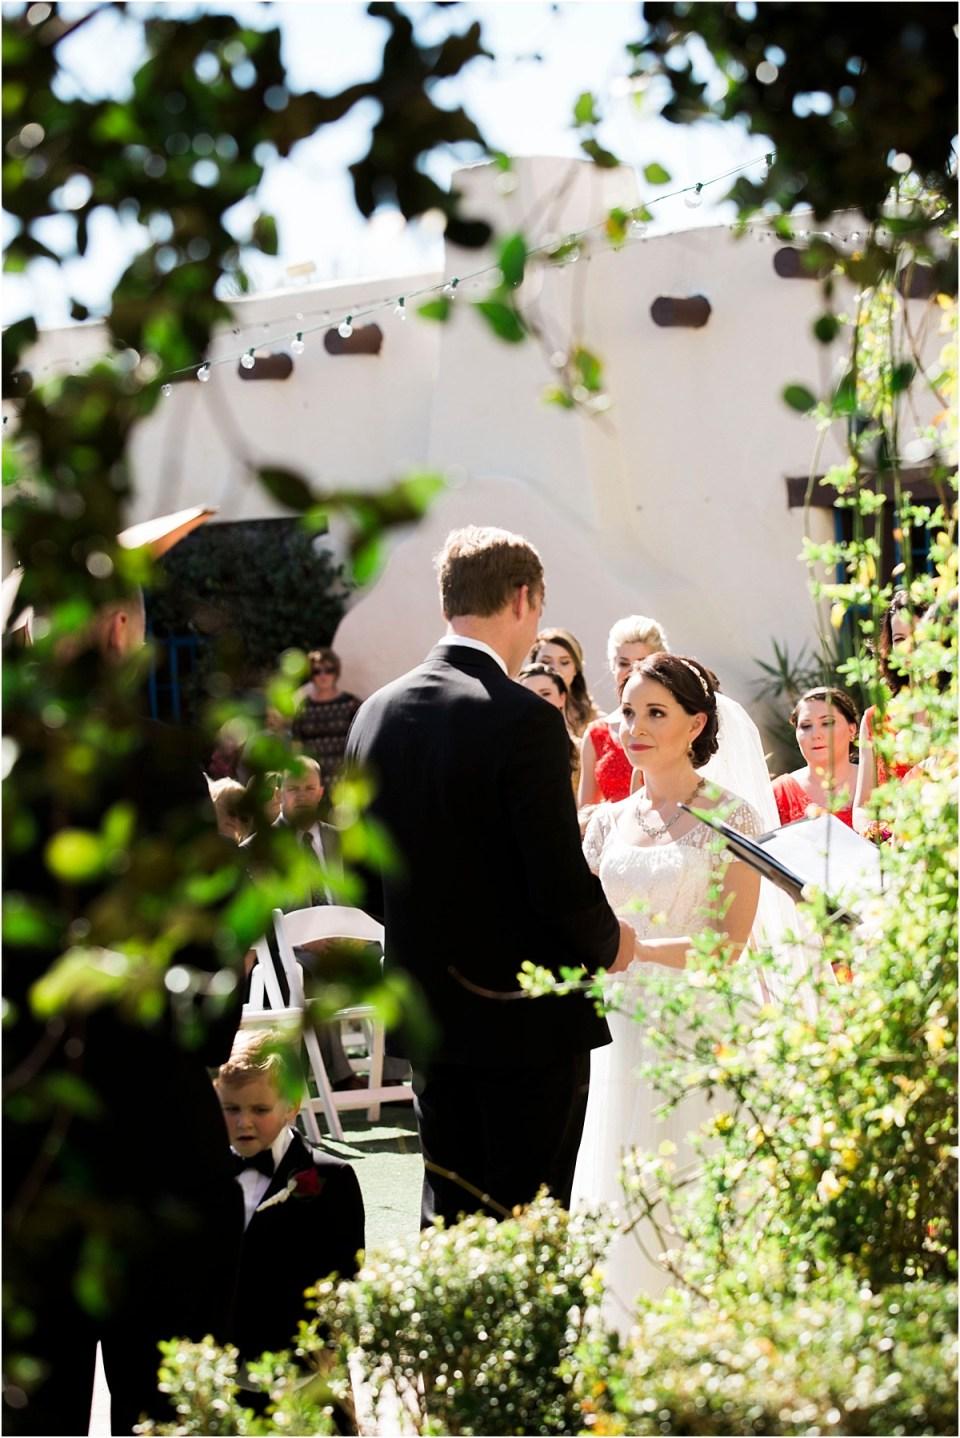 Wedding Ceremony at Hacienda Del Sol, Tucson, Arizona.